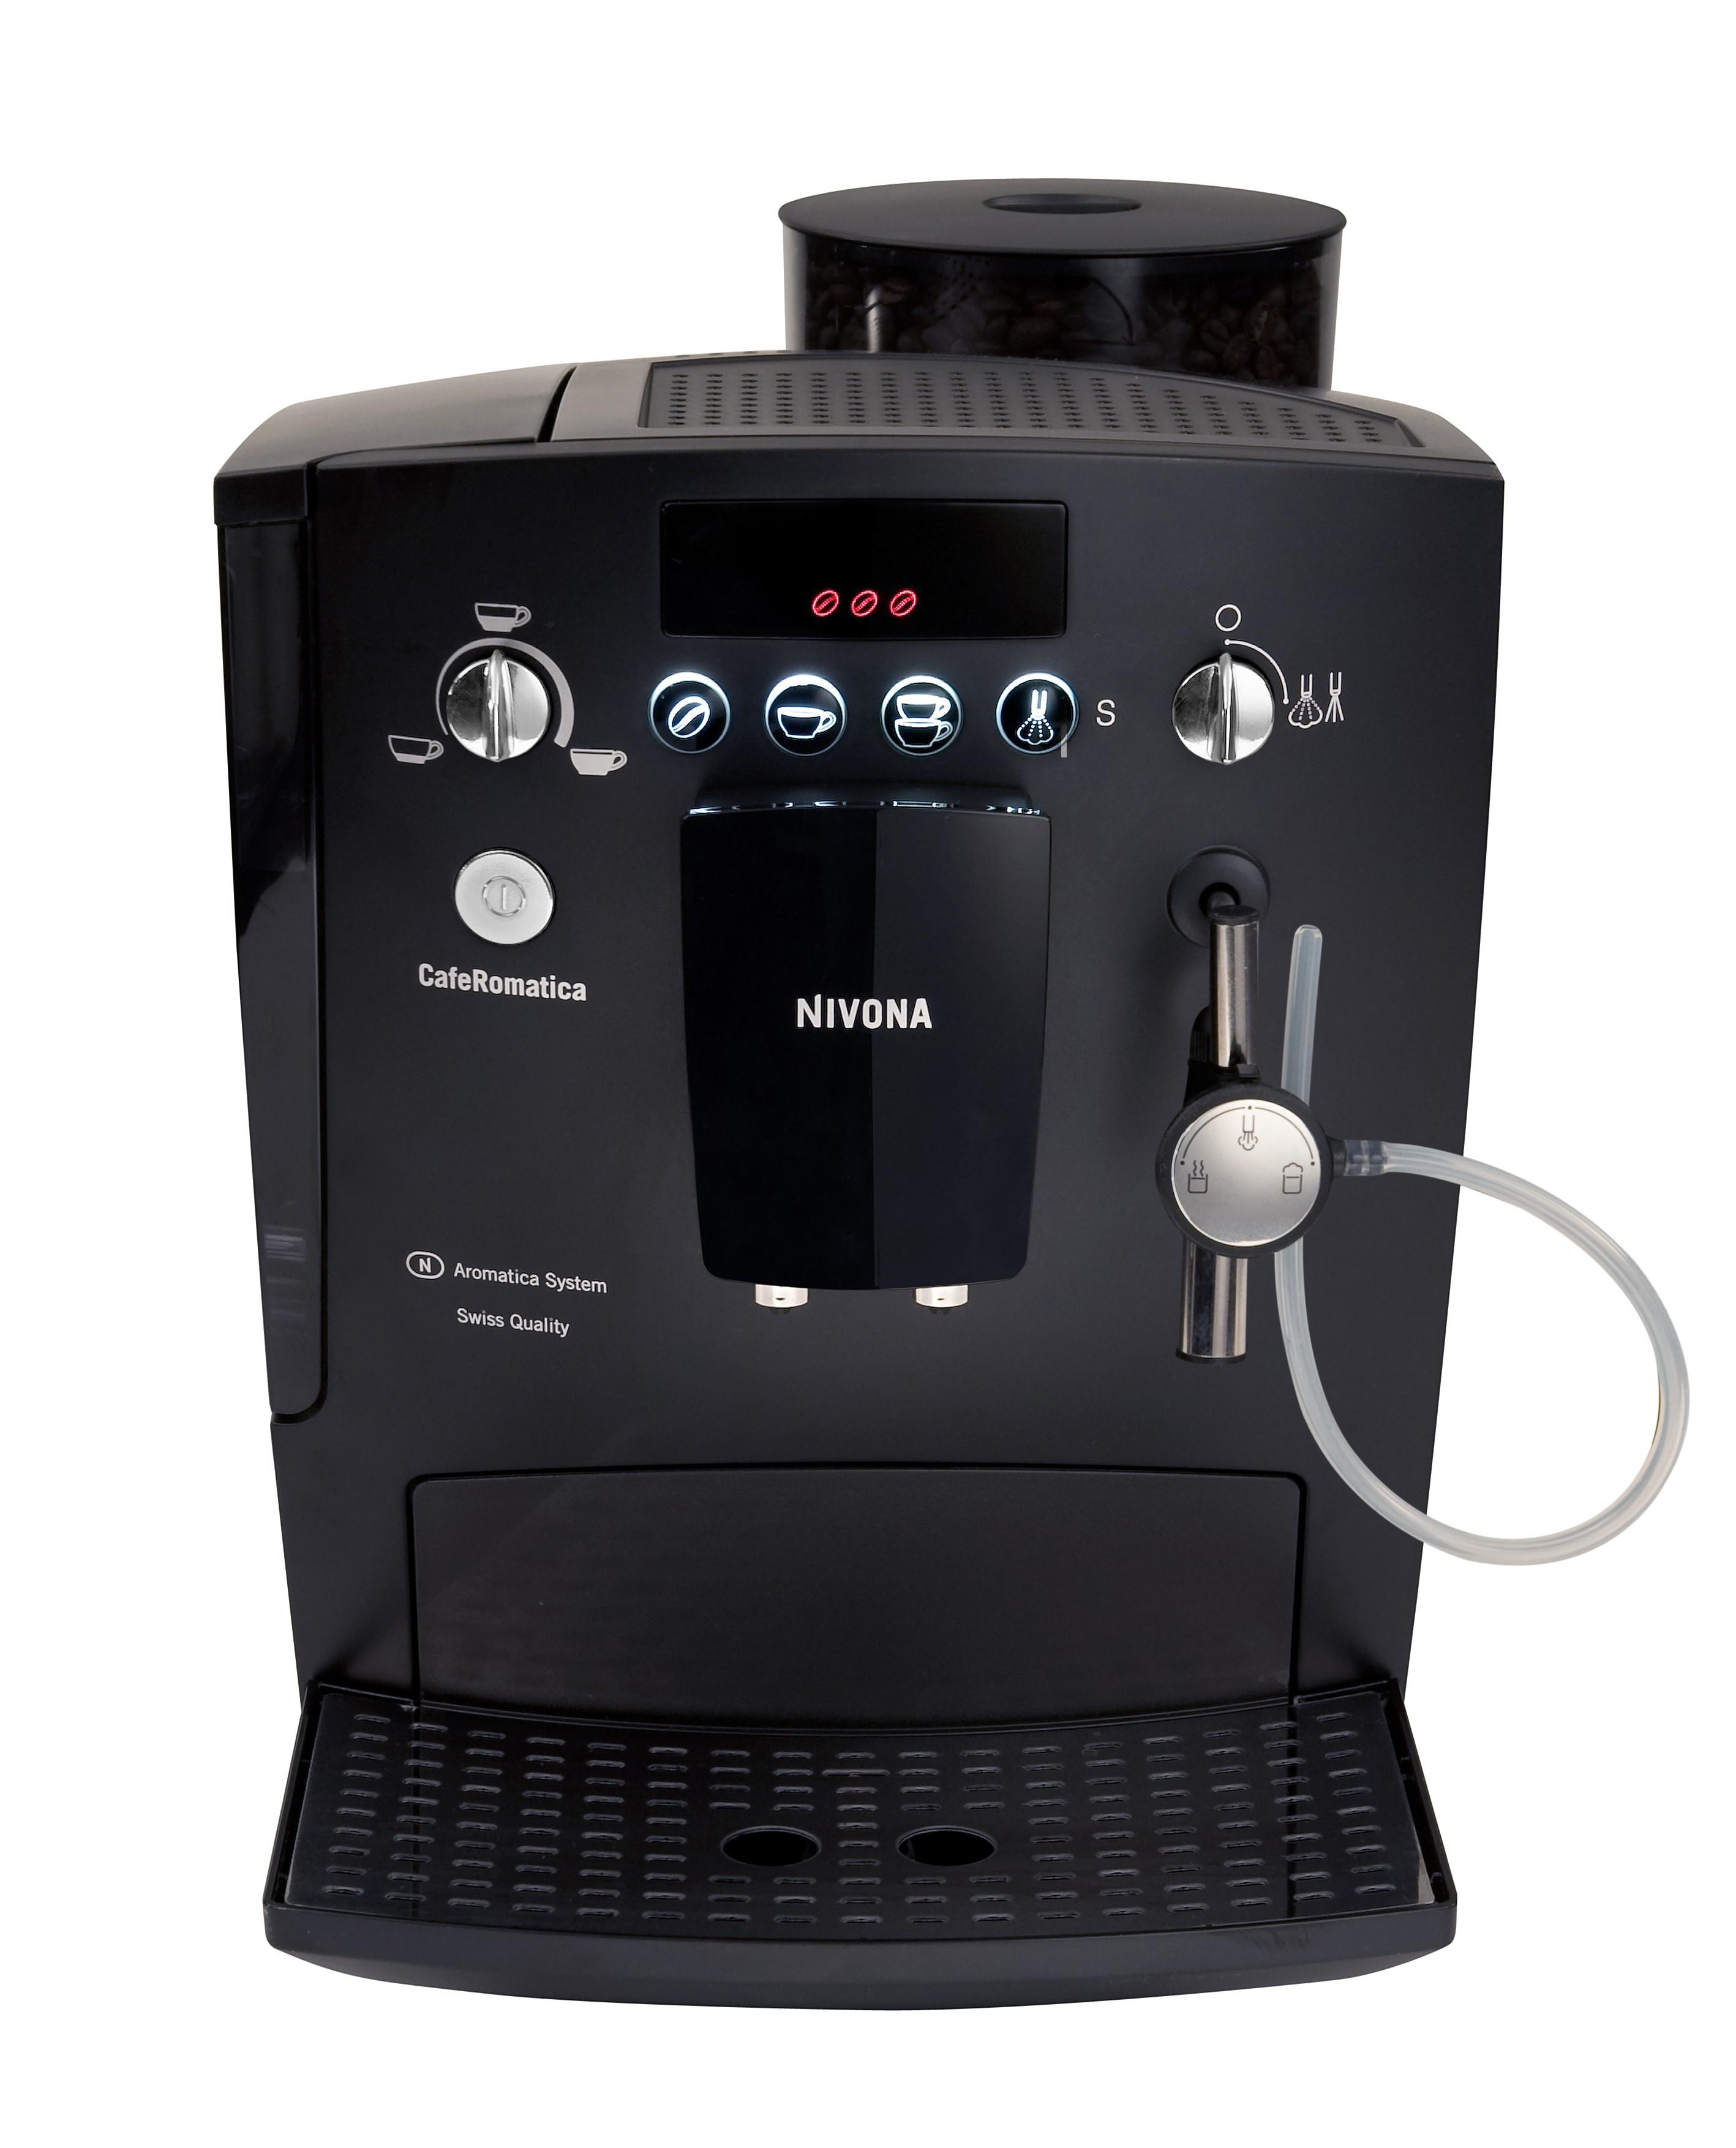 nivona nicr635 caferomatica kaffeevollautomat die dunkle. Black Bedroom Furniture Sets. Home Design Ideas